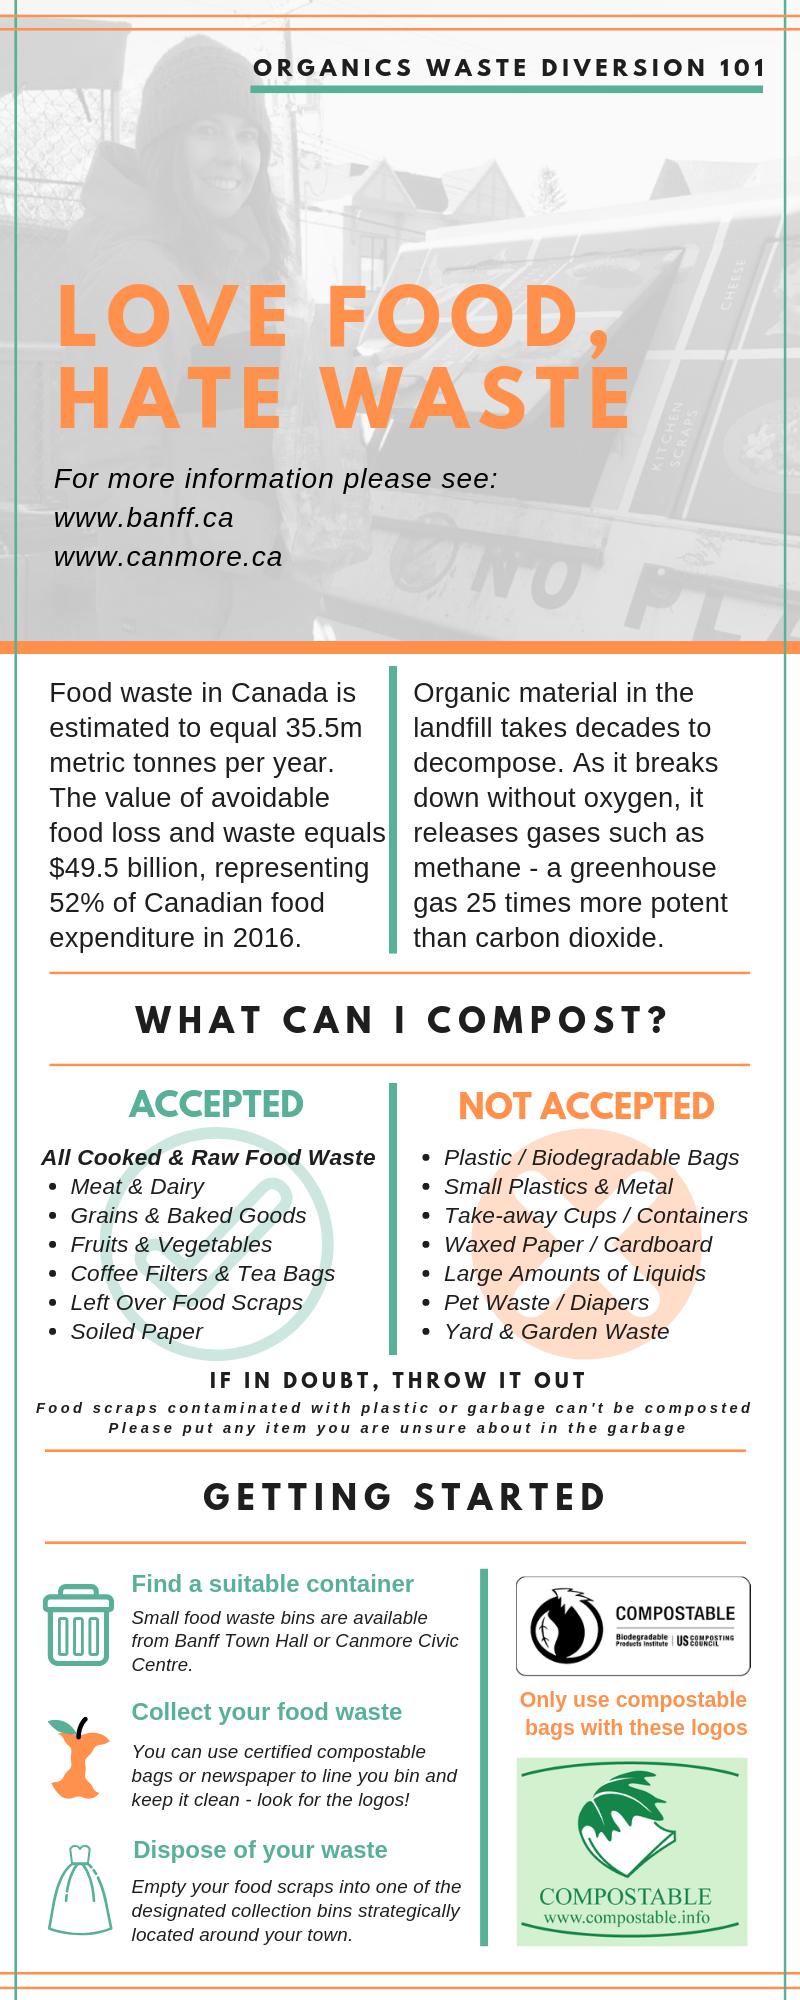 Organics waste diversion 101 (1).png